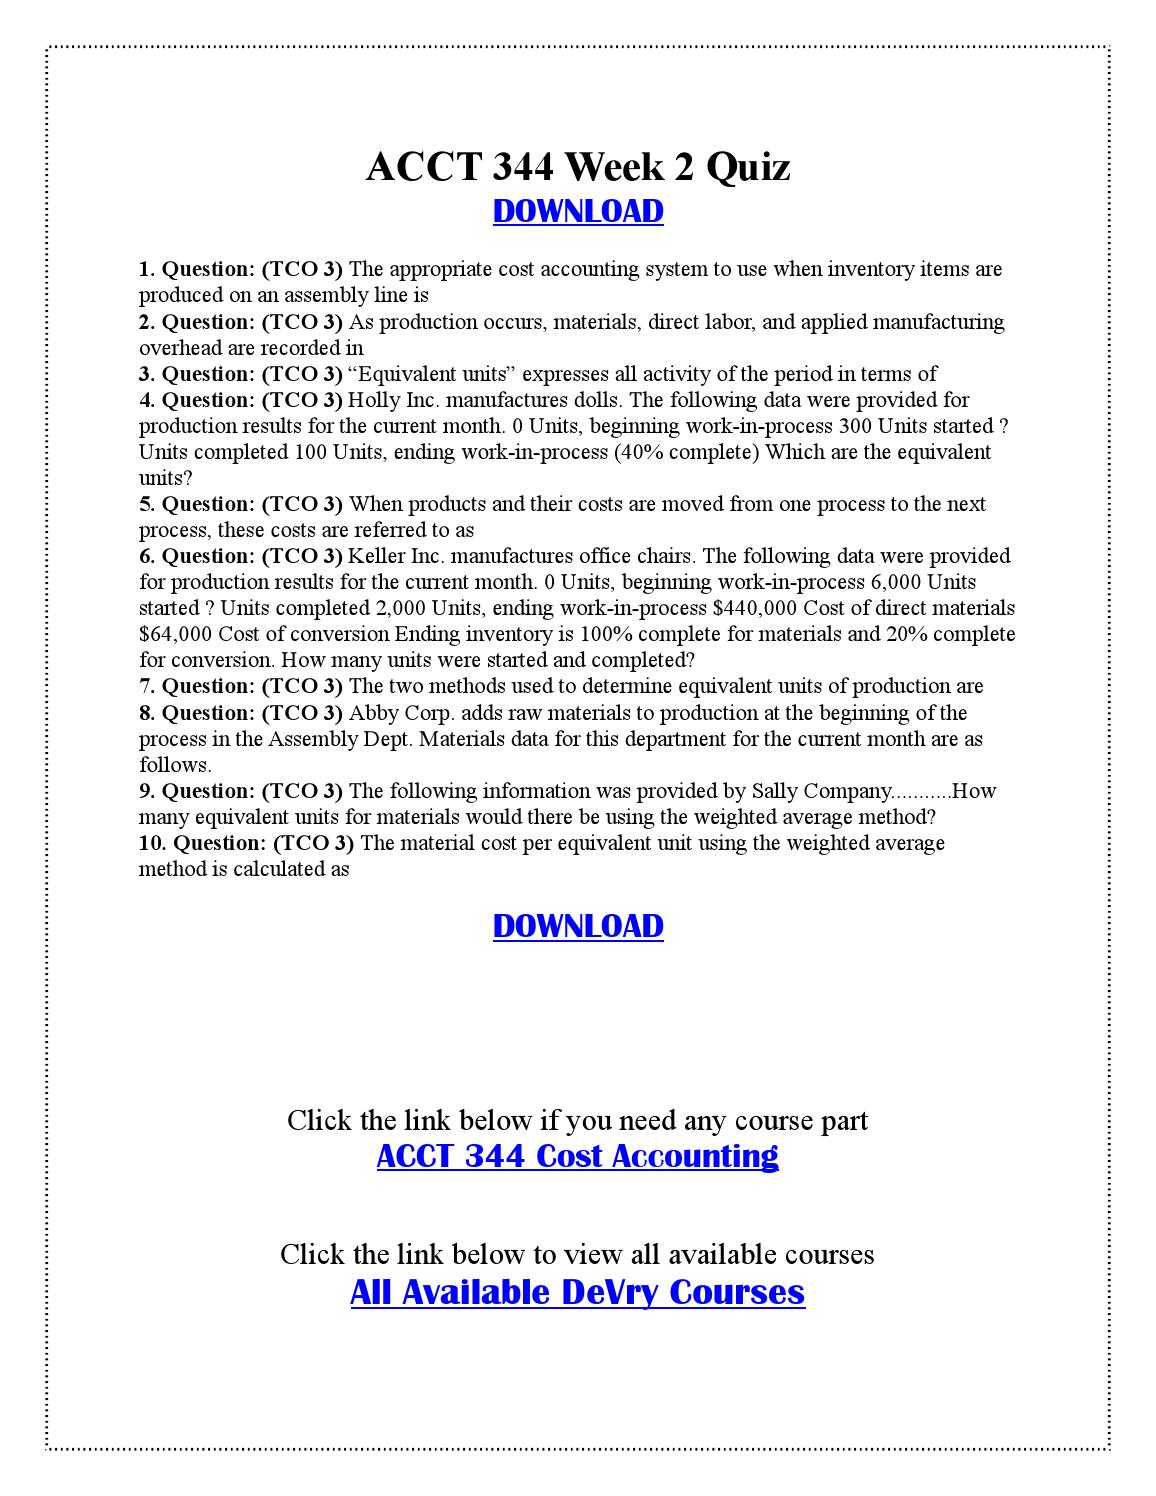 ACCT 344 Final Exam